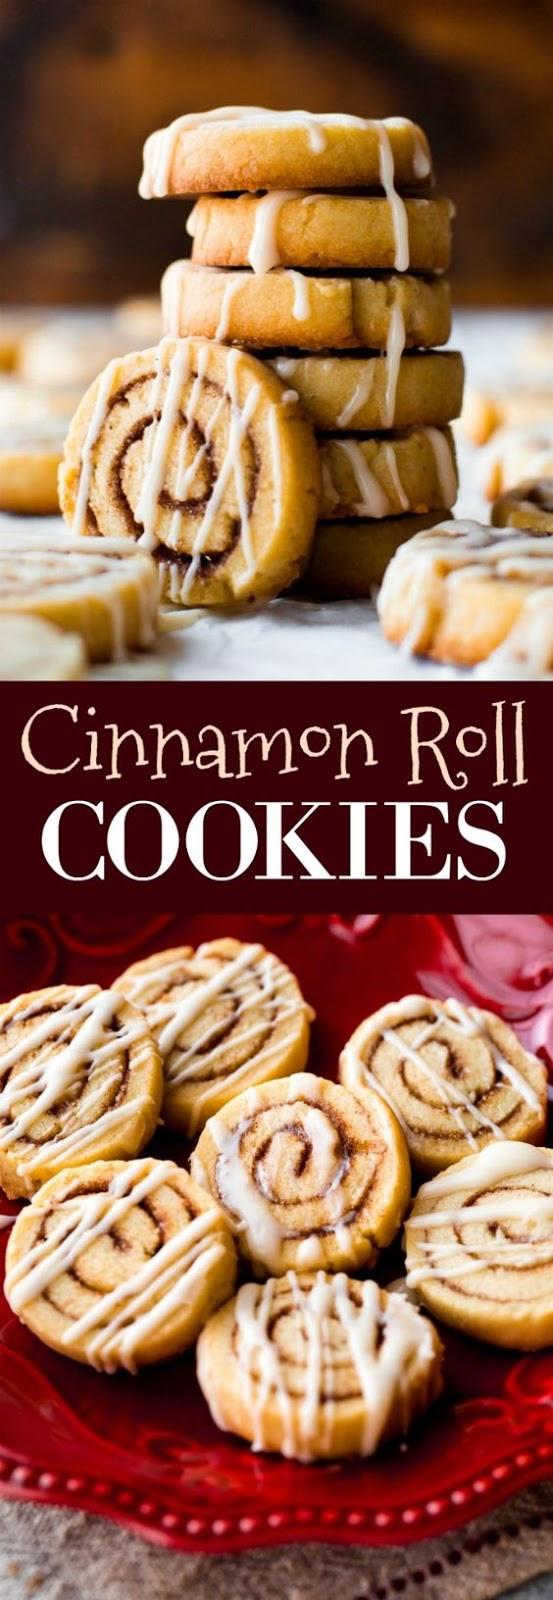 Cinnamon Roll Cookies #cinnamon #roll #cookies #cookierecipes